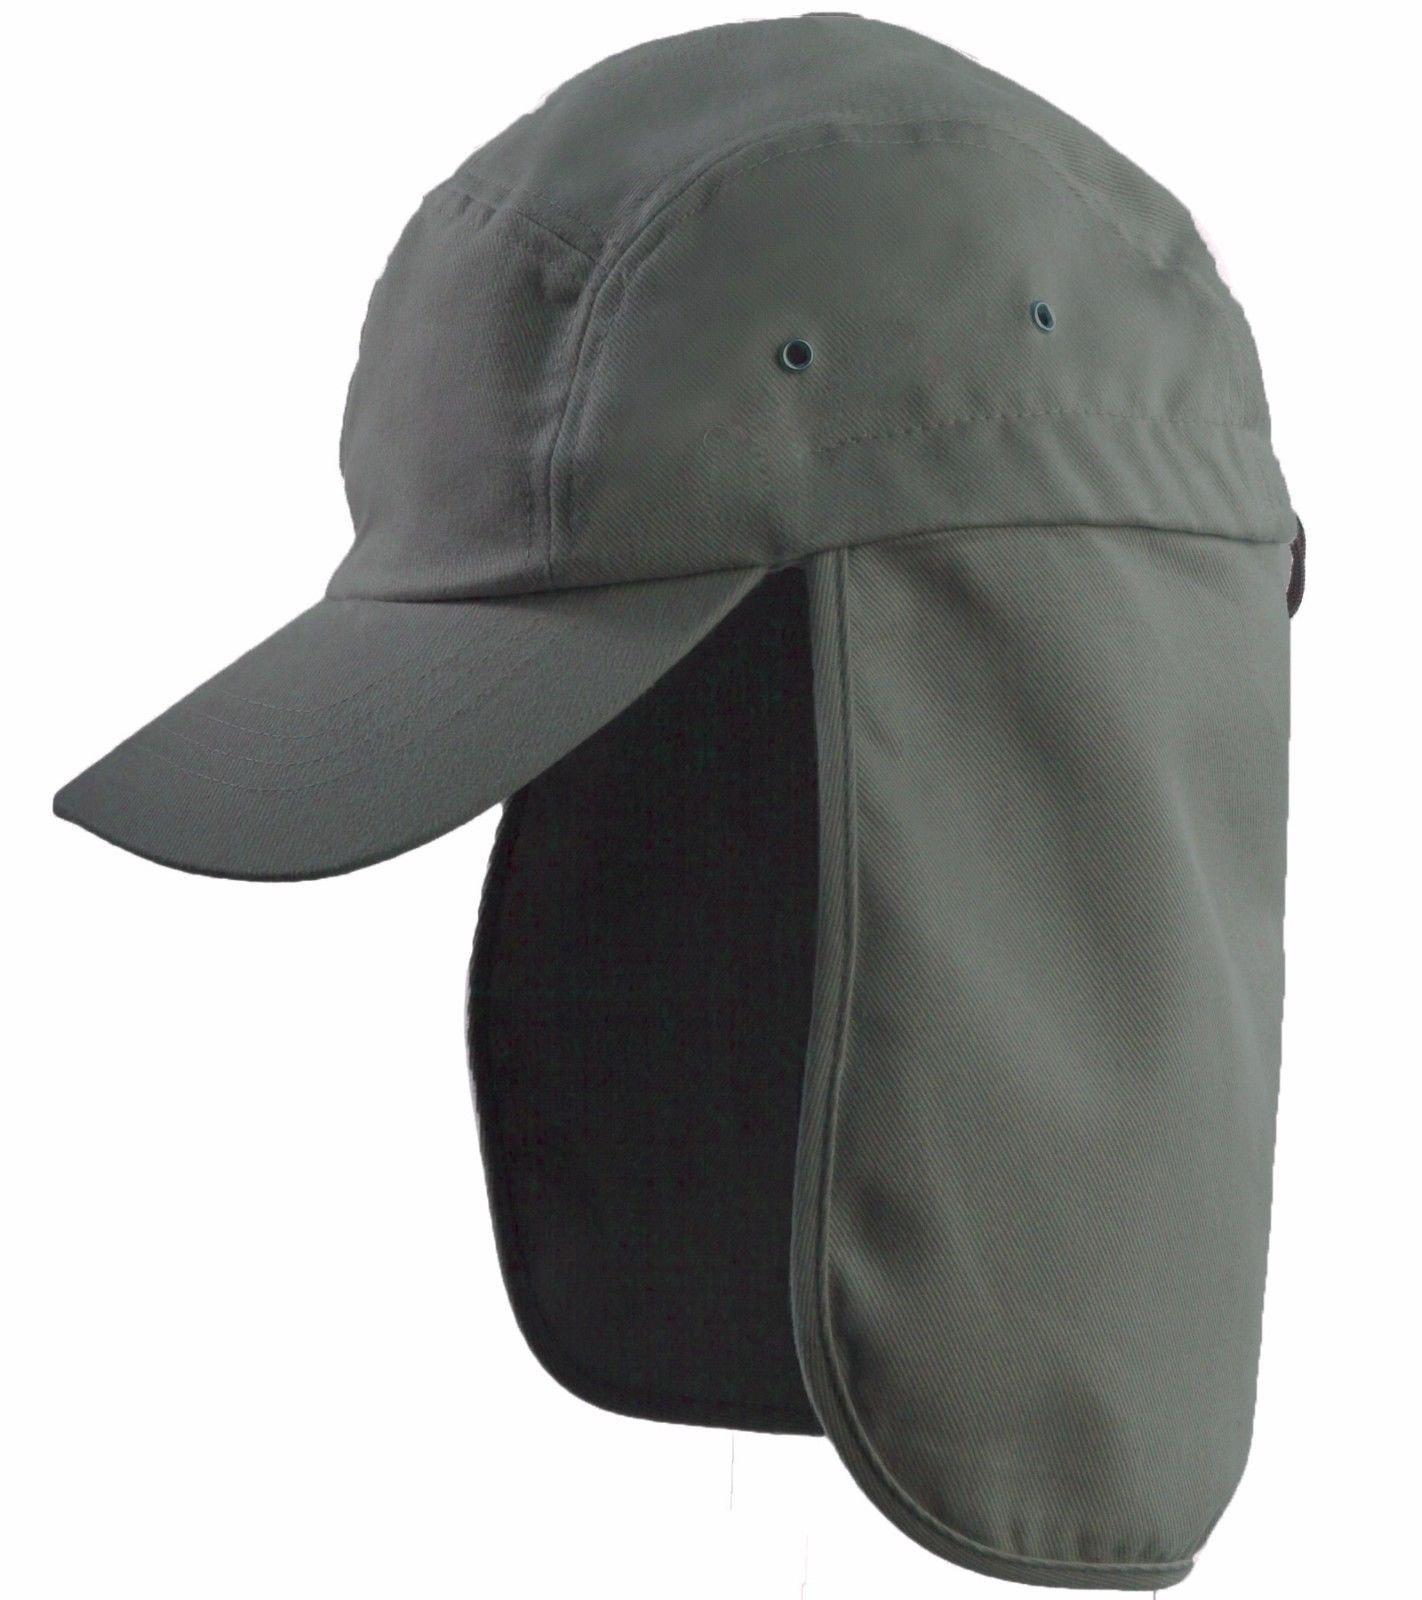 5a1a1199732 LA Gen Men s Cap Neck Cover Hiking Fishing Hunting Camo Army Bucket Sun Flap  (Olive)